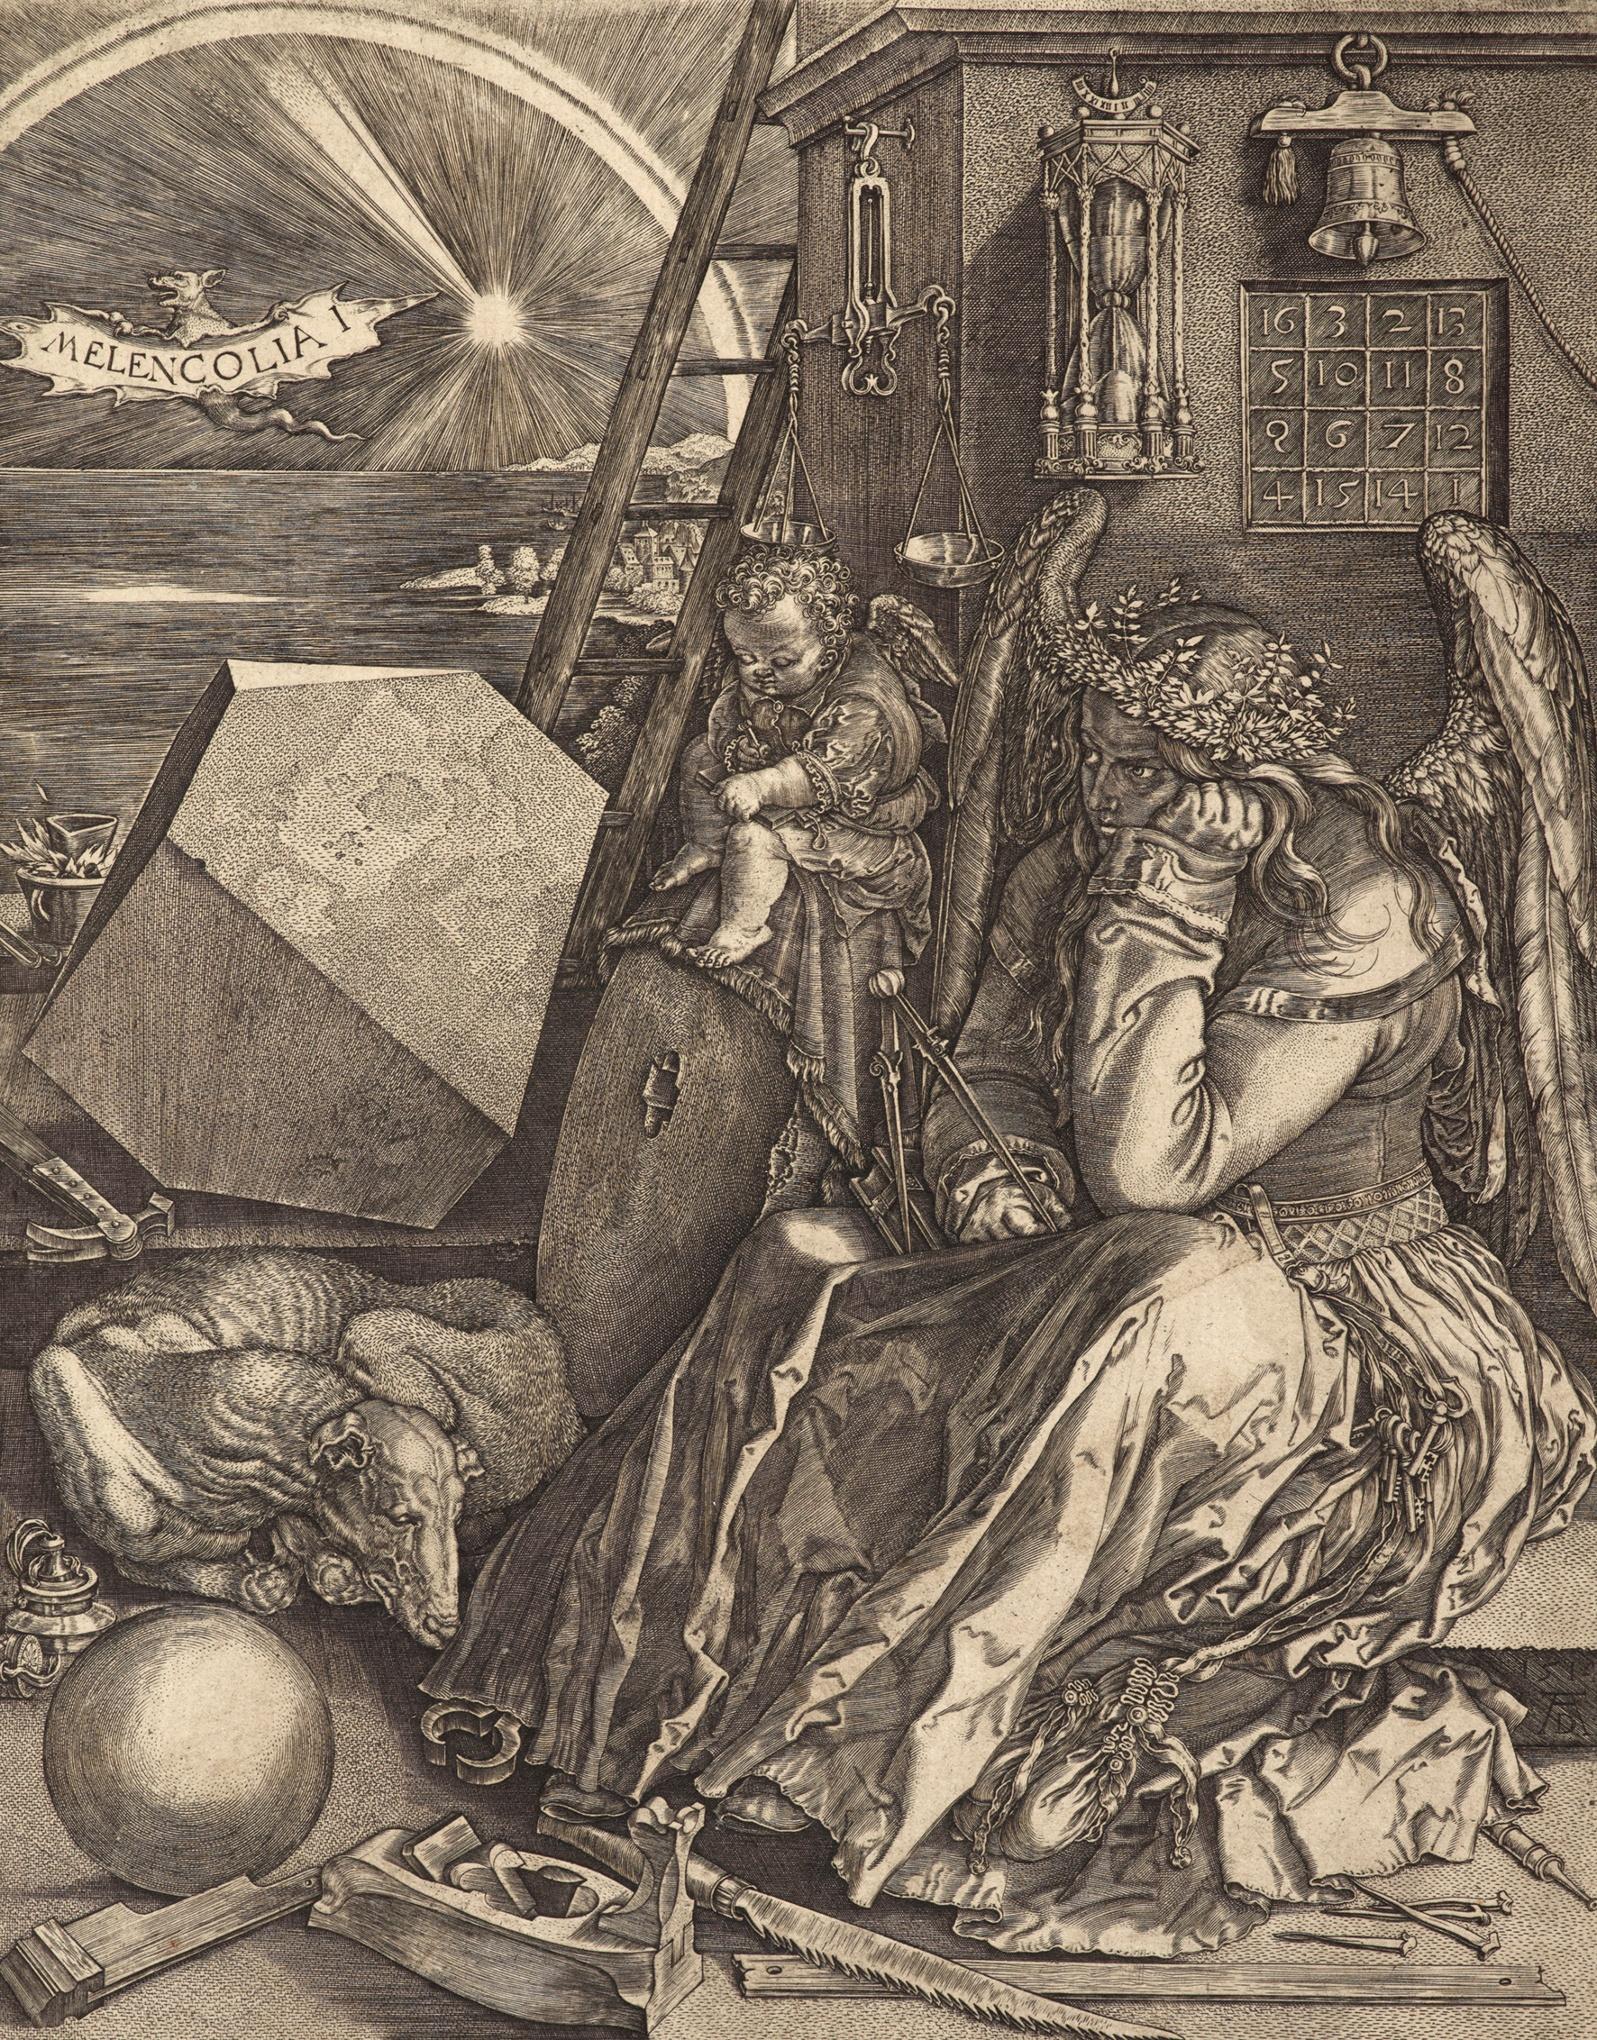 Albrecht Durer – Melancholia (1514)